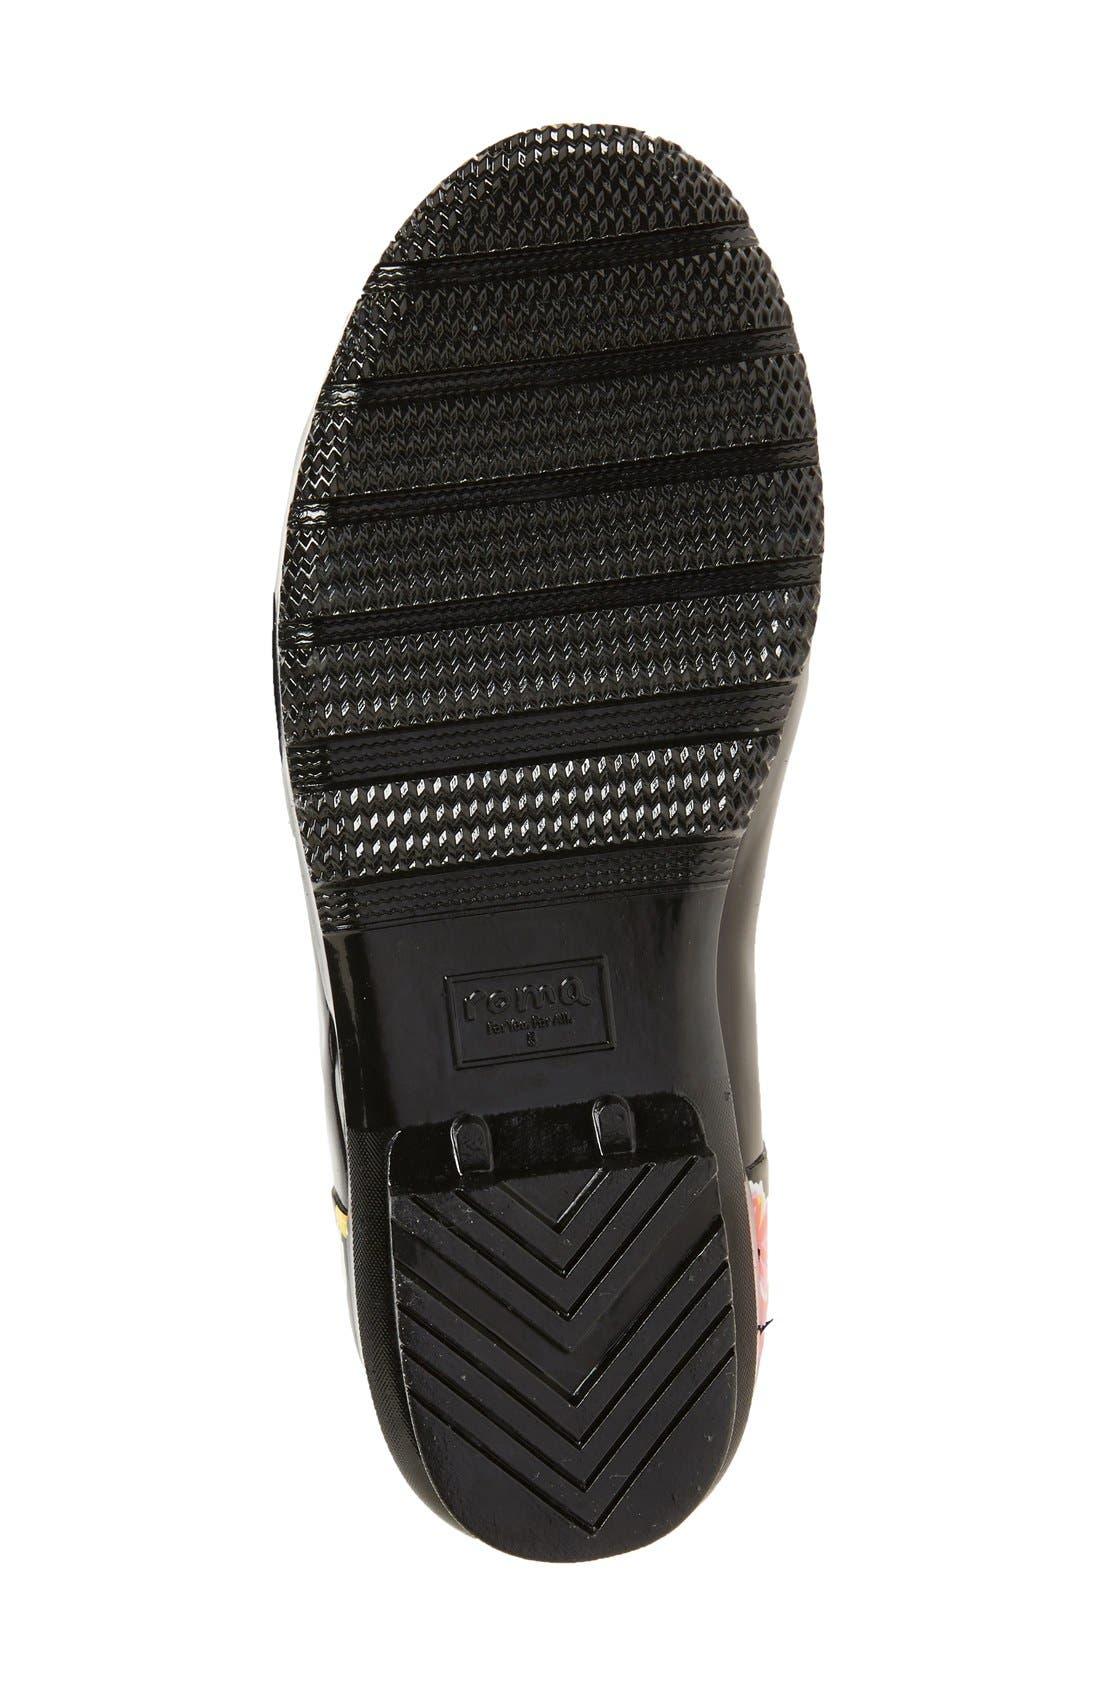 'Opinca' Waterproof Rain Boot,                             Alternate thumbnail 4, color,                             003